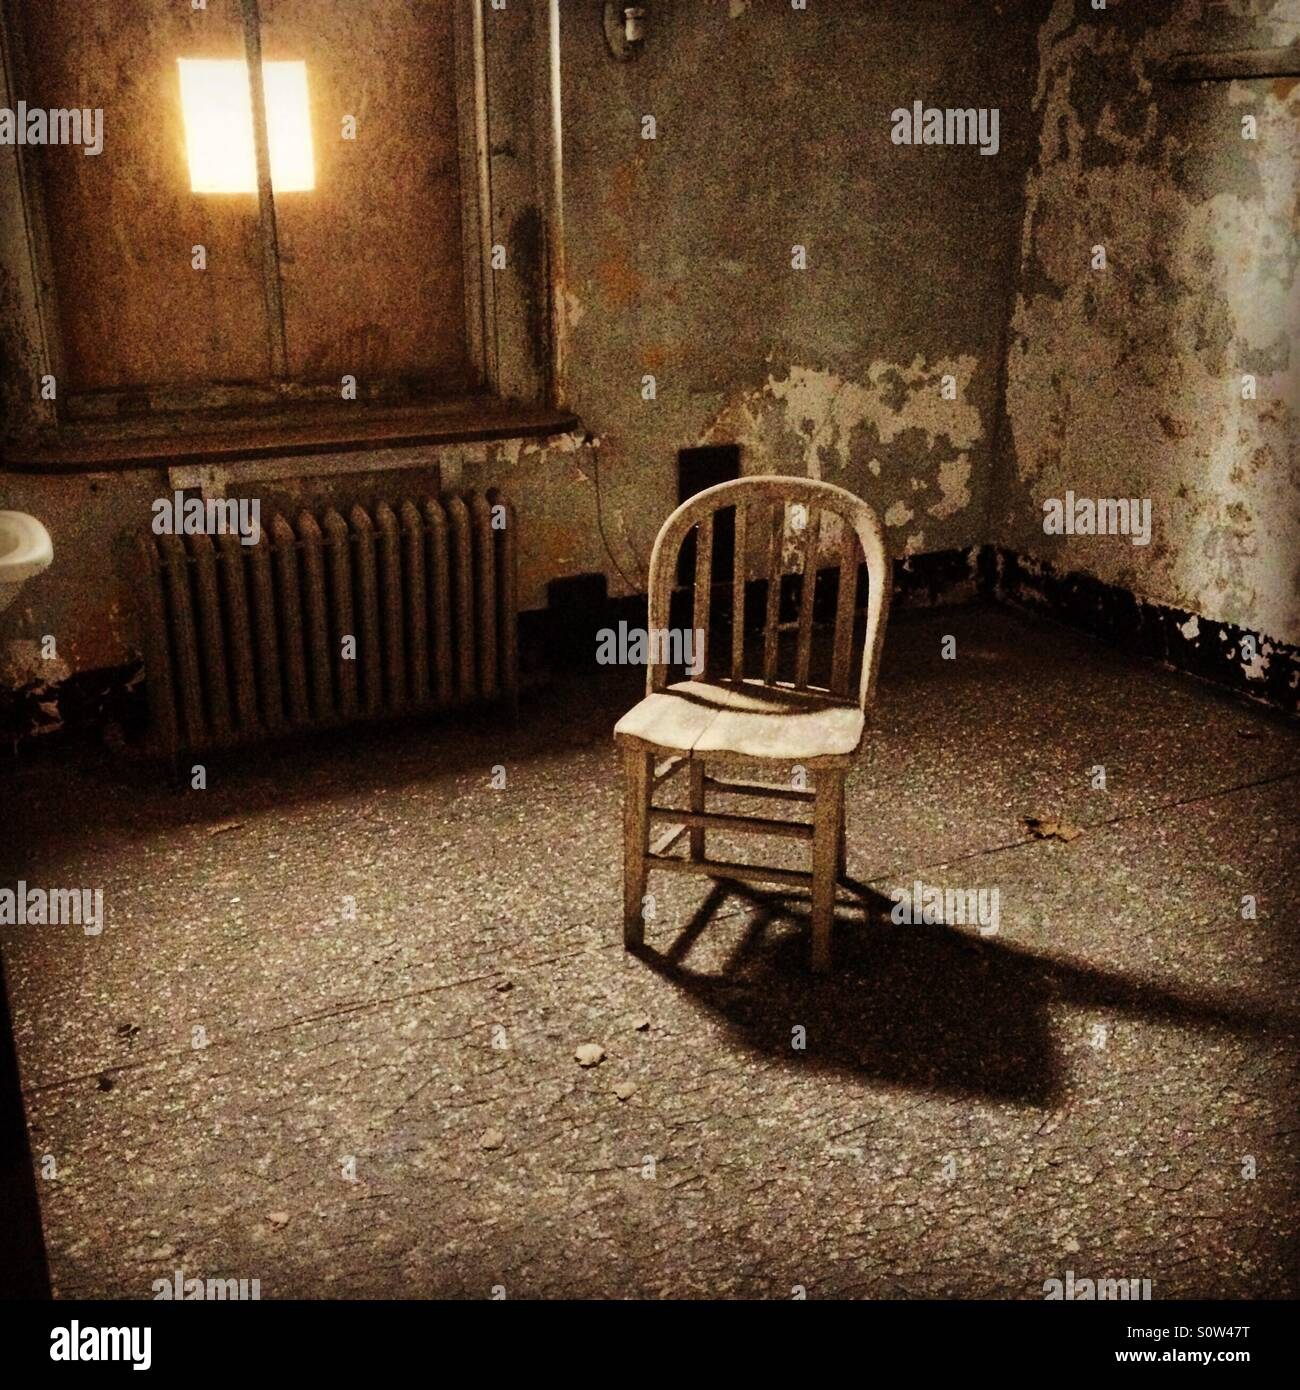 Abandoned Hospital Room Stock Photos